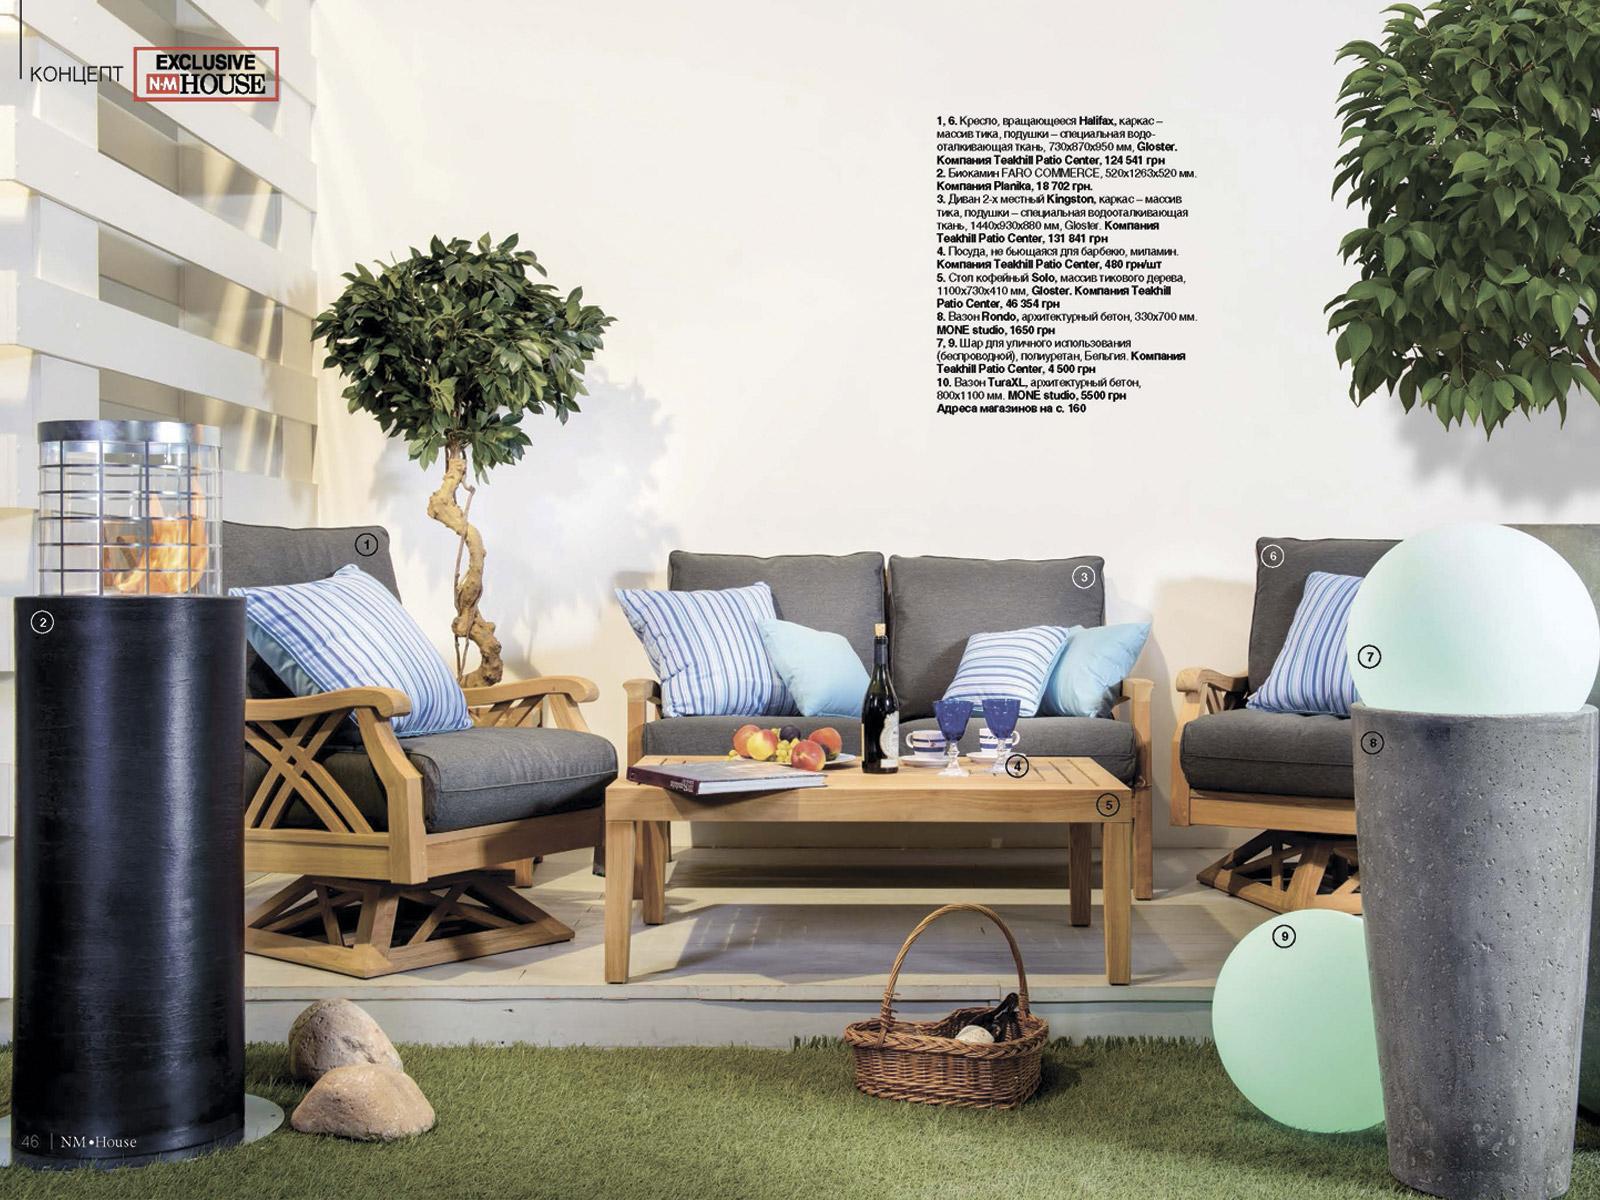 Концептуальная съемка для журнала NM HOUSE. Мобильный биокамин Planika Faro Commerce. Биокамин для сада, террасы.